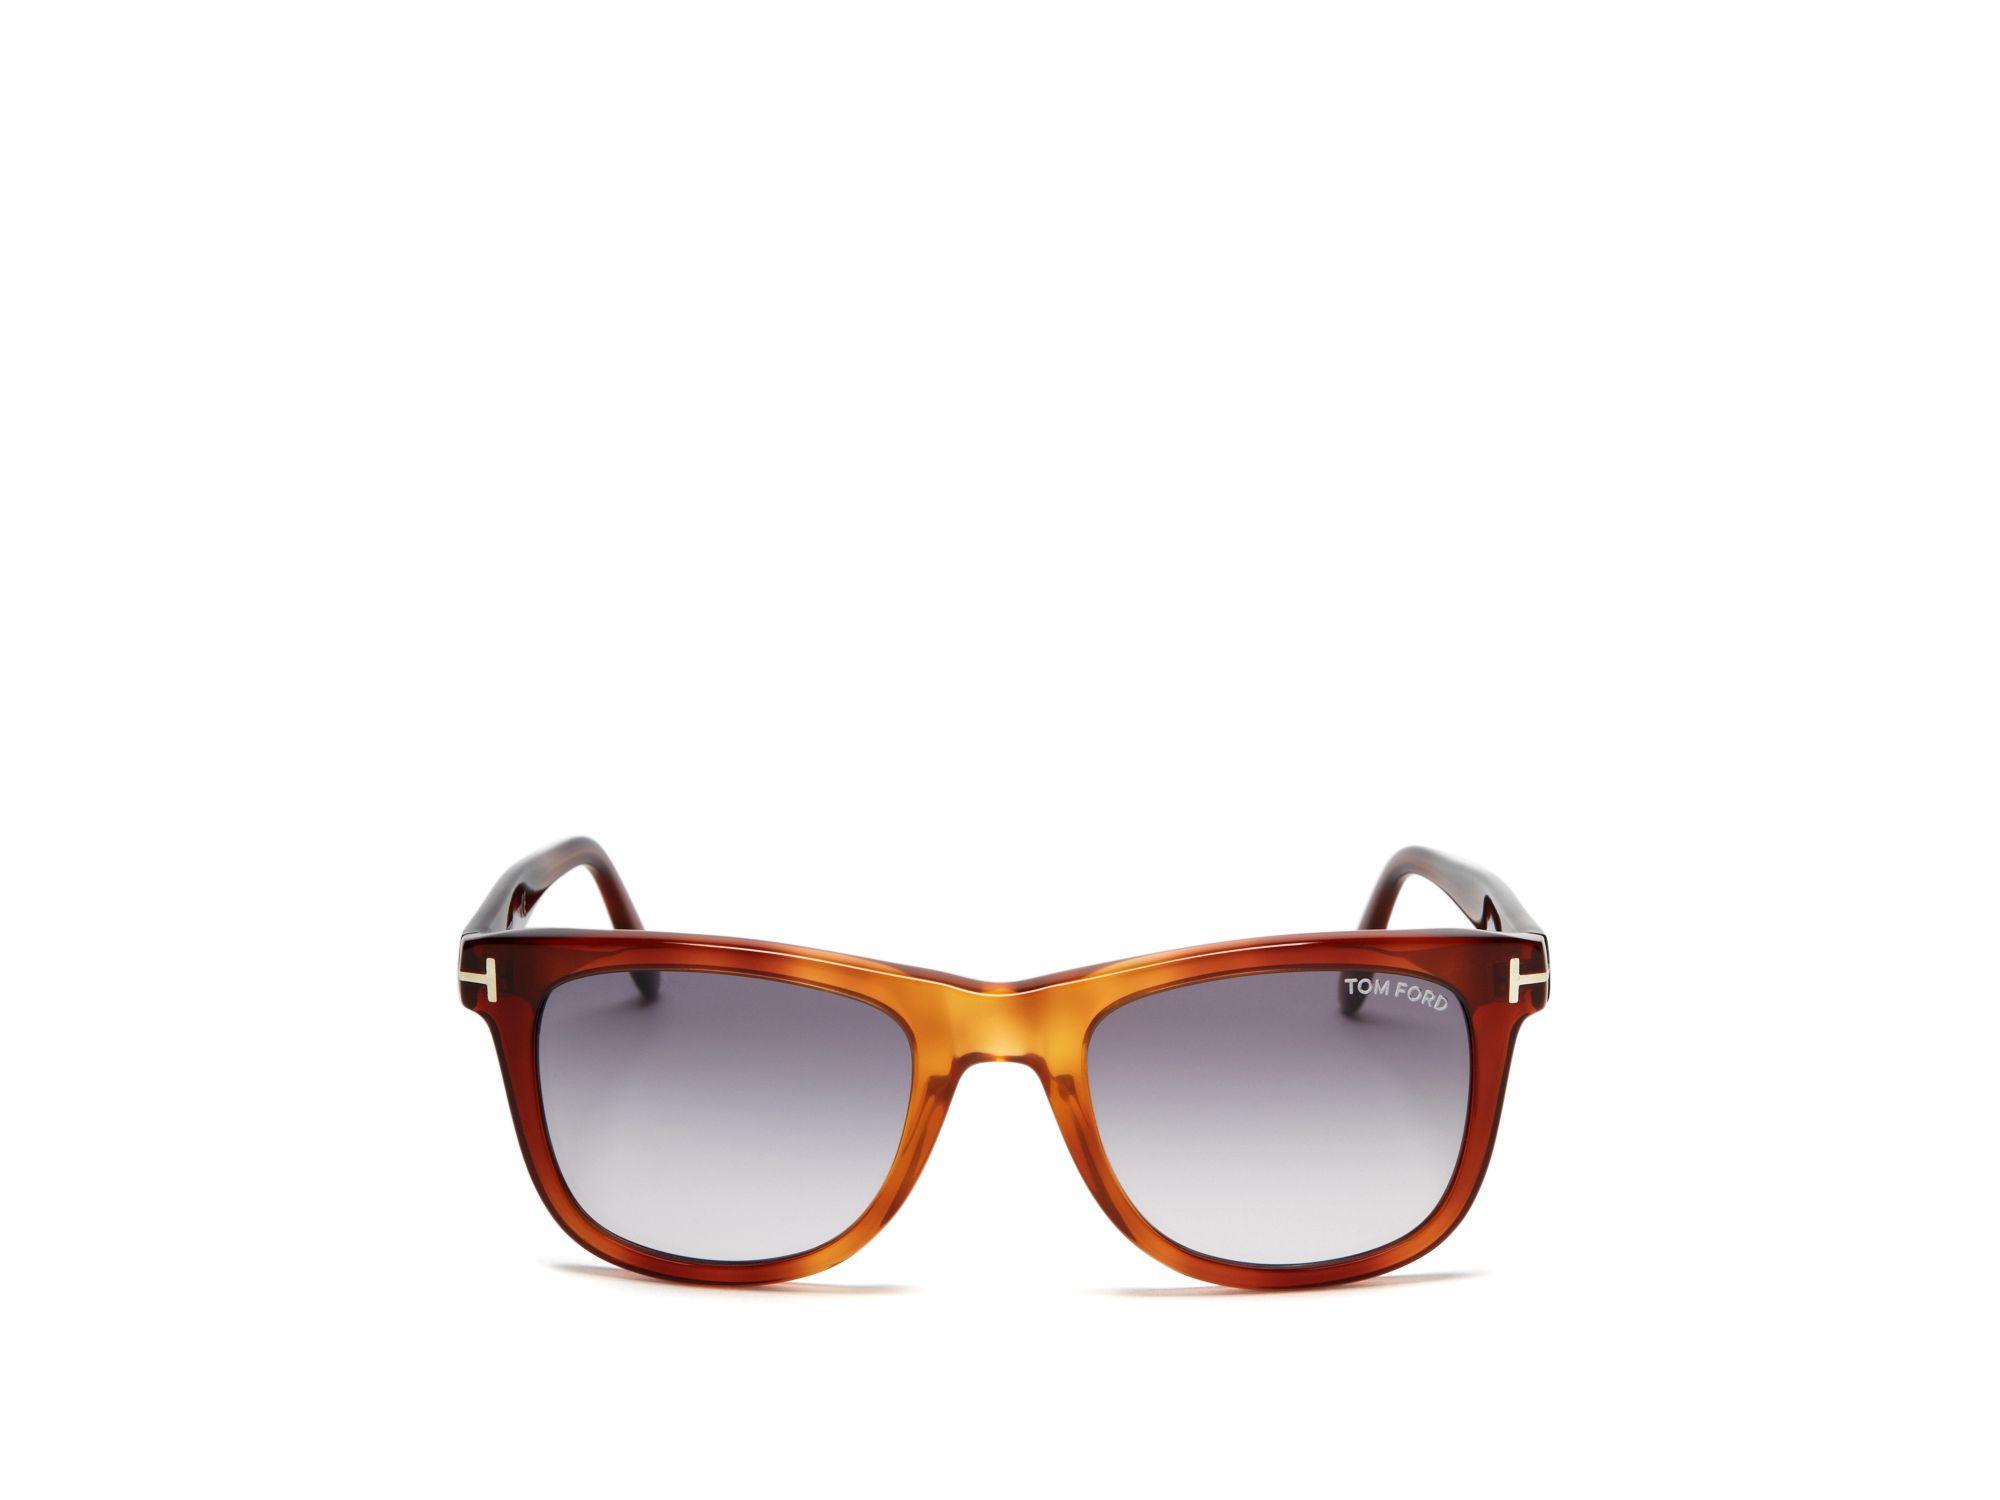 fada50d5d8 Lyst - Tom Ford Leo Wayfarer Sunglasses in Brown for Men